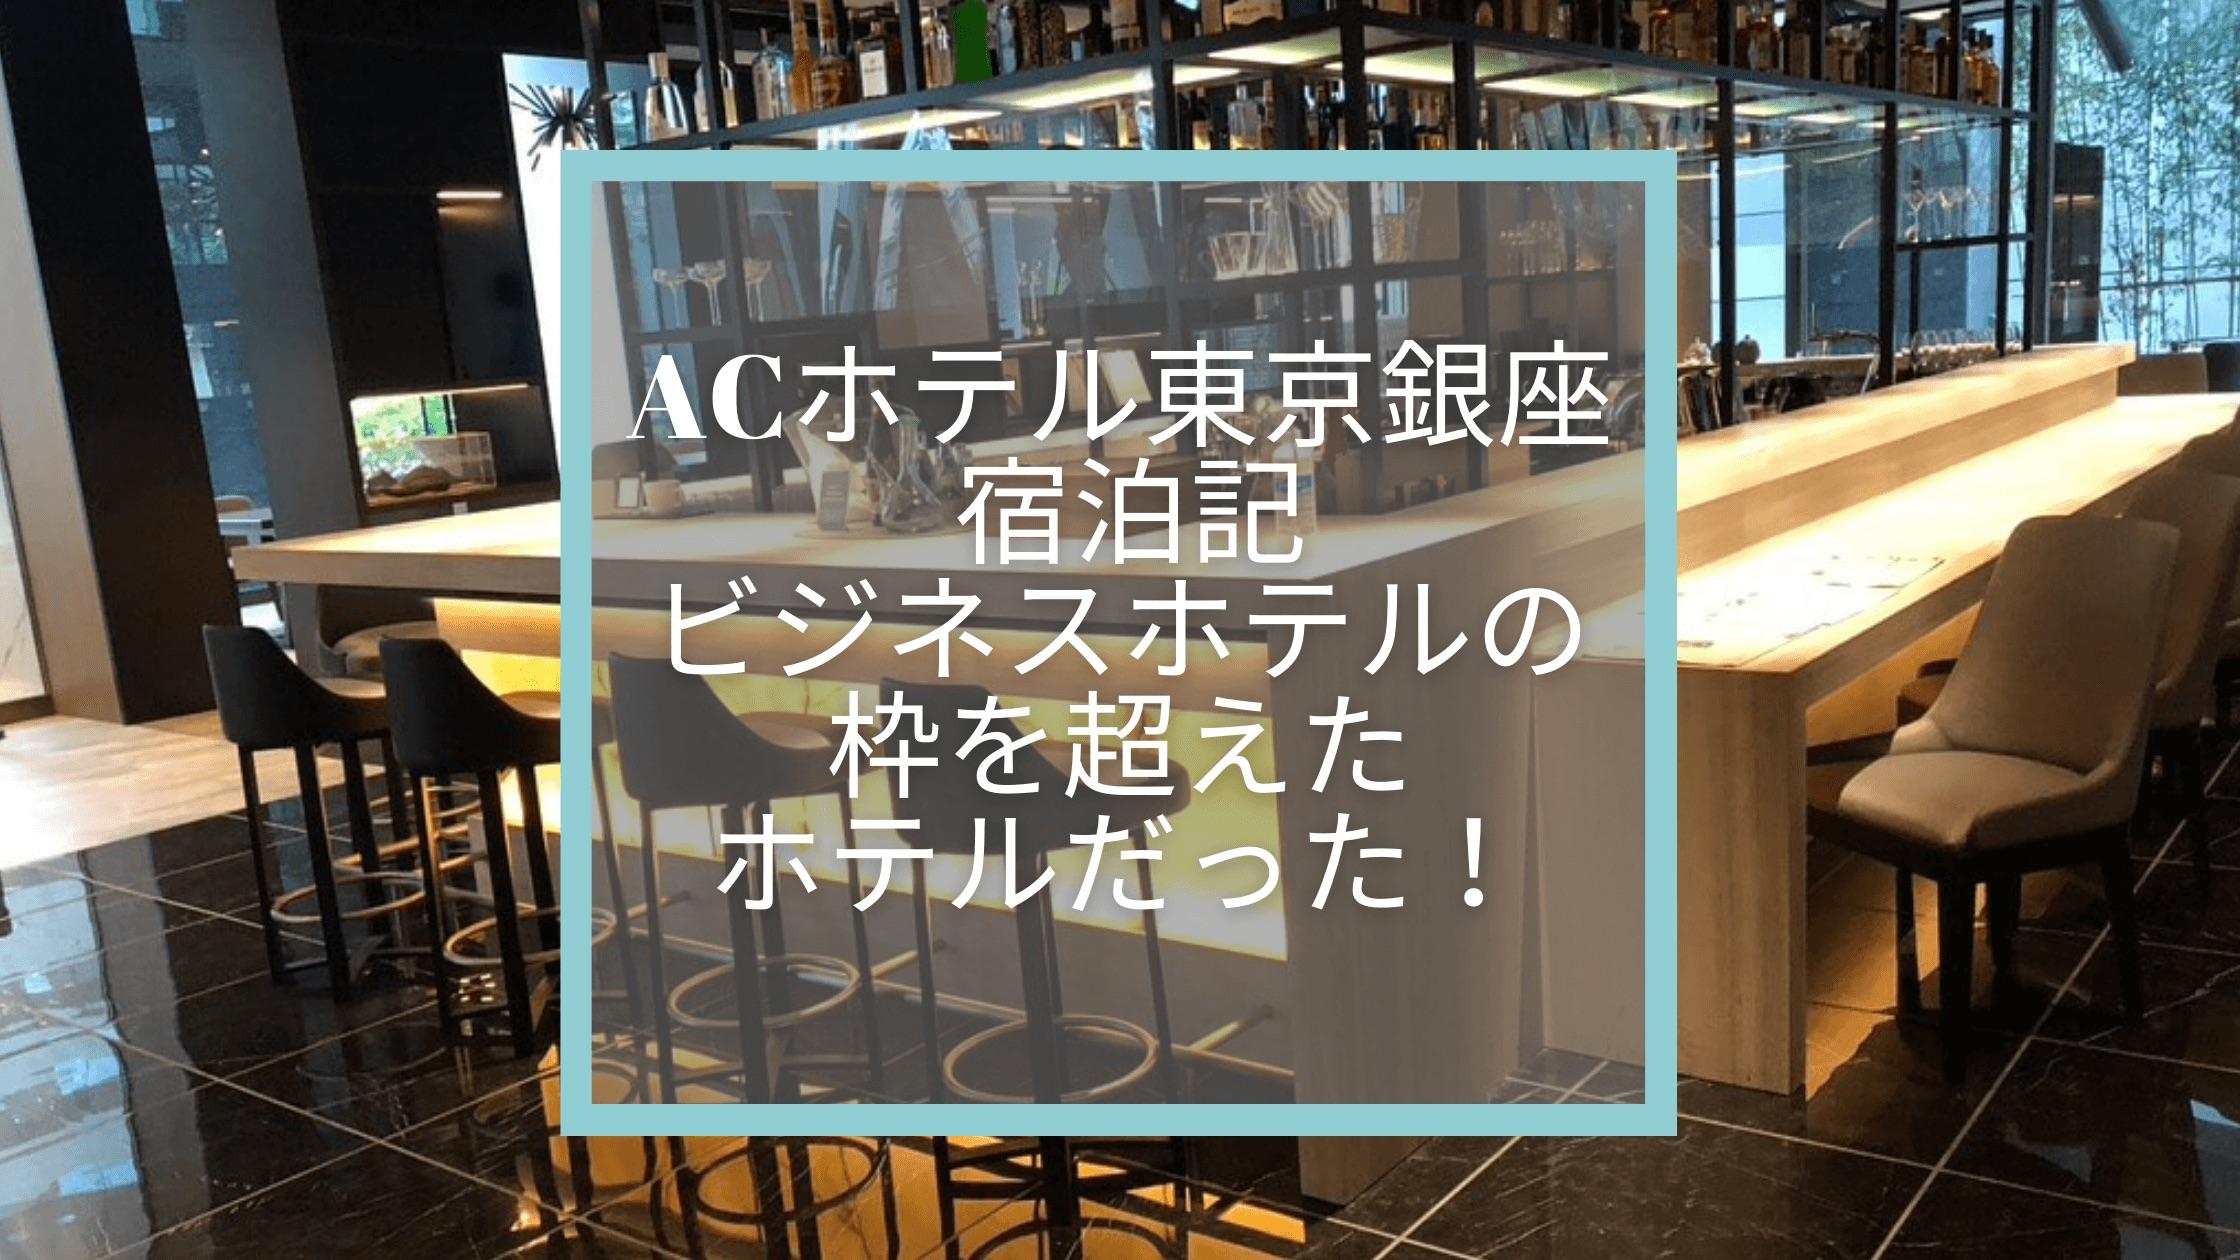 ACホテル 銀座 宿泊記